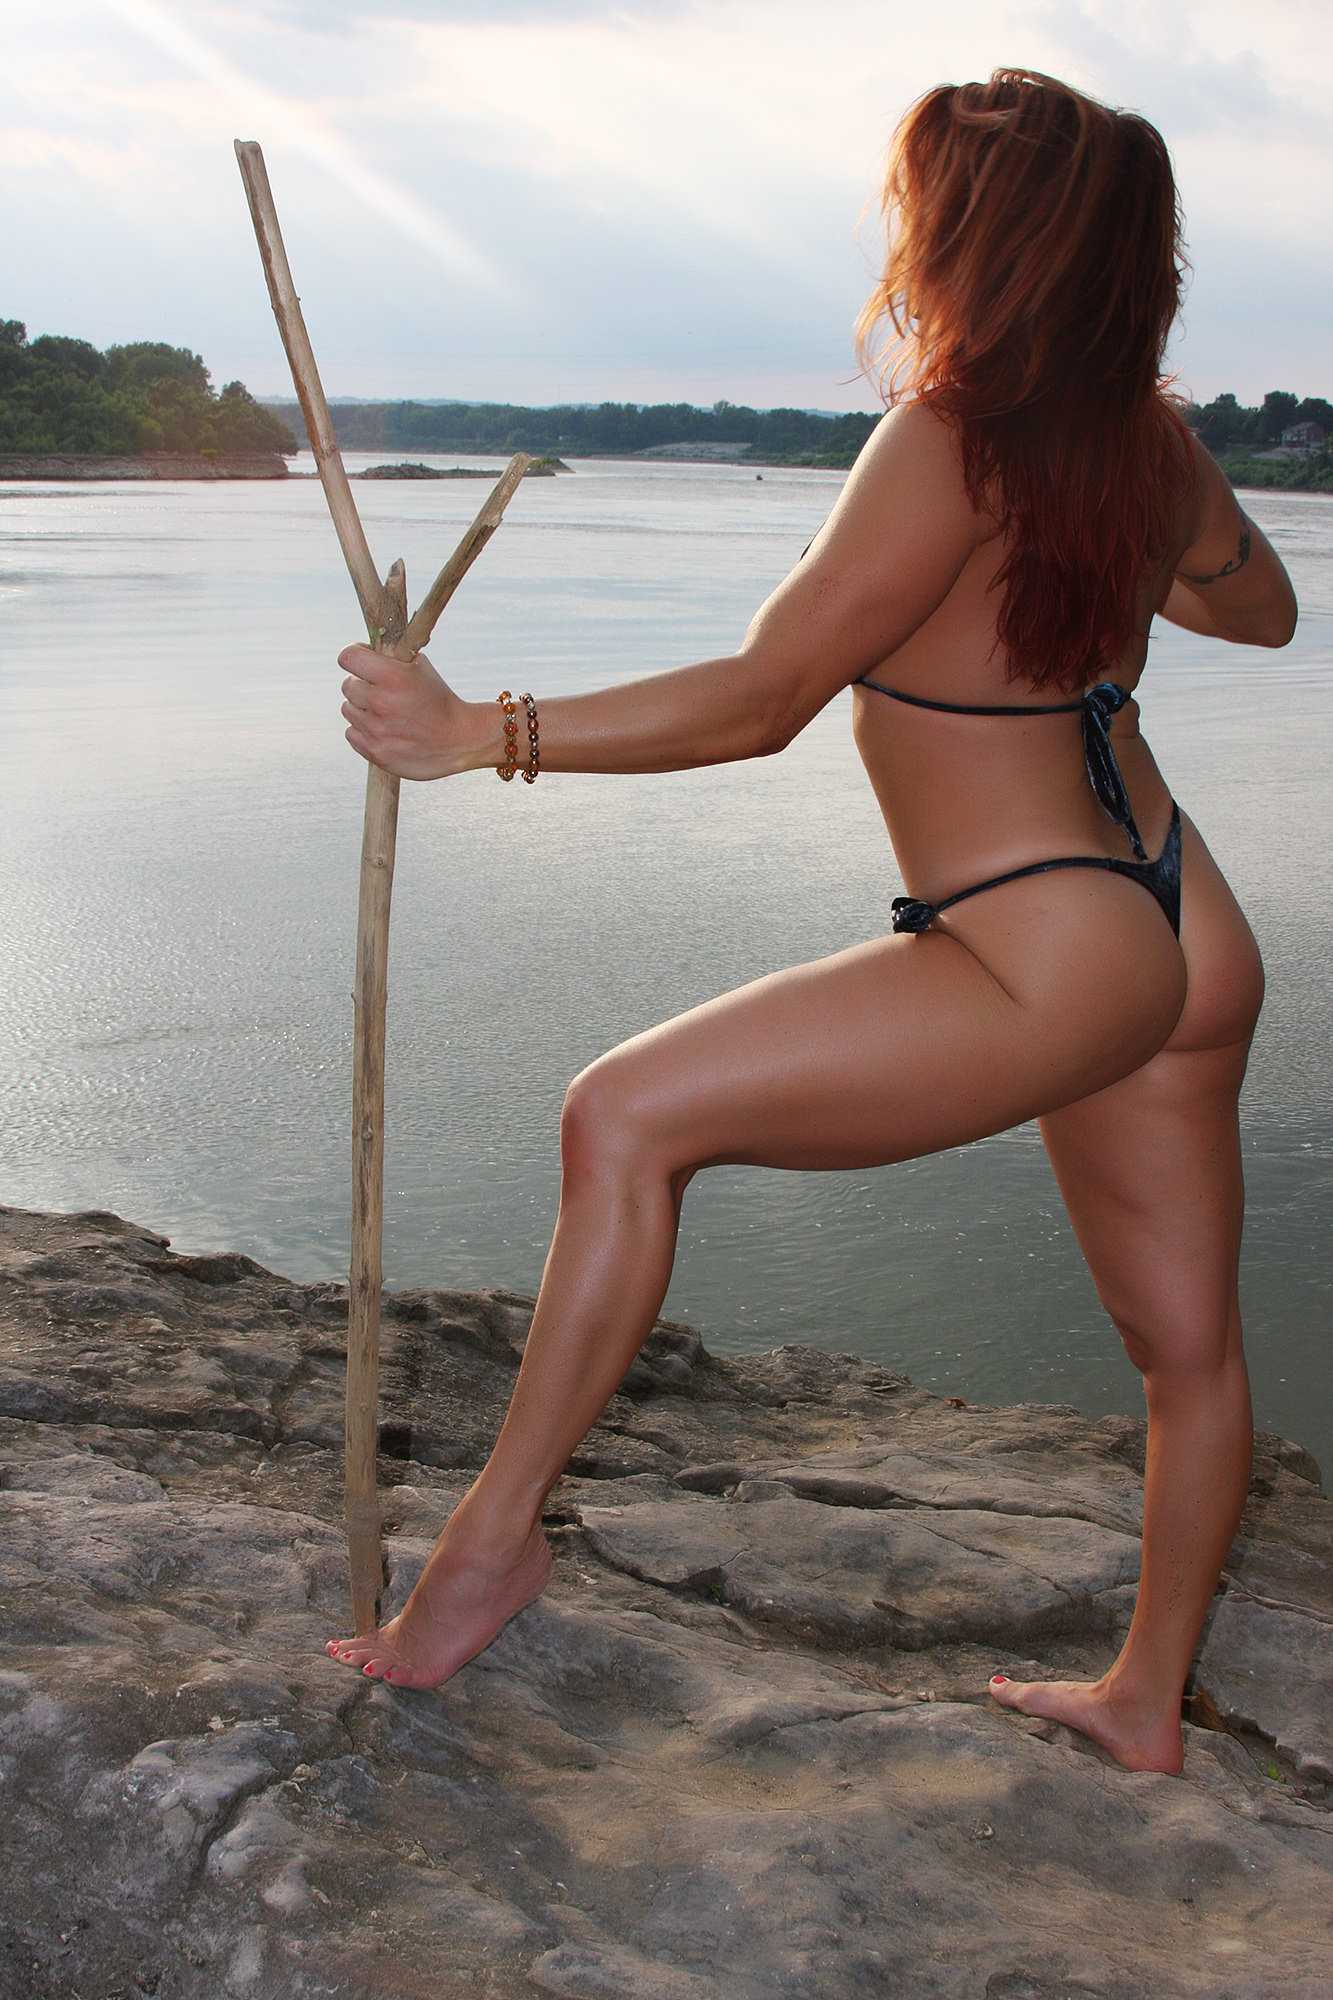 April Hunter hot butt pic